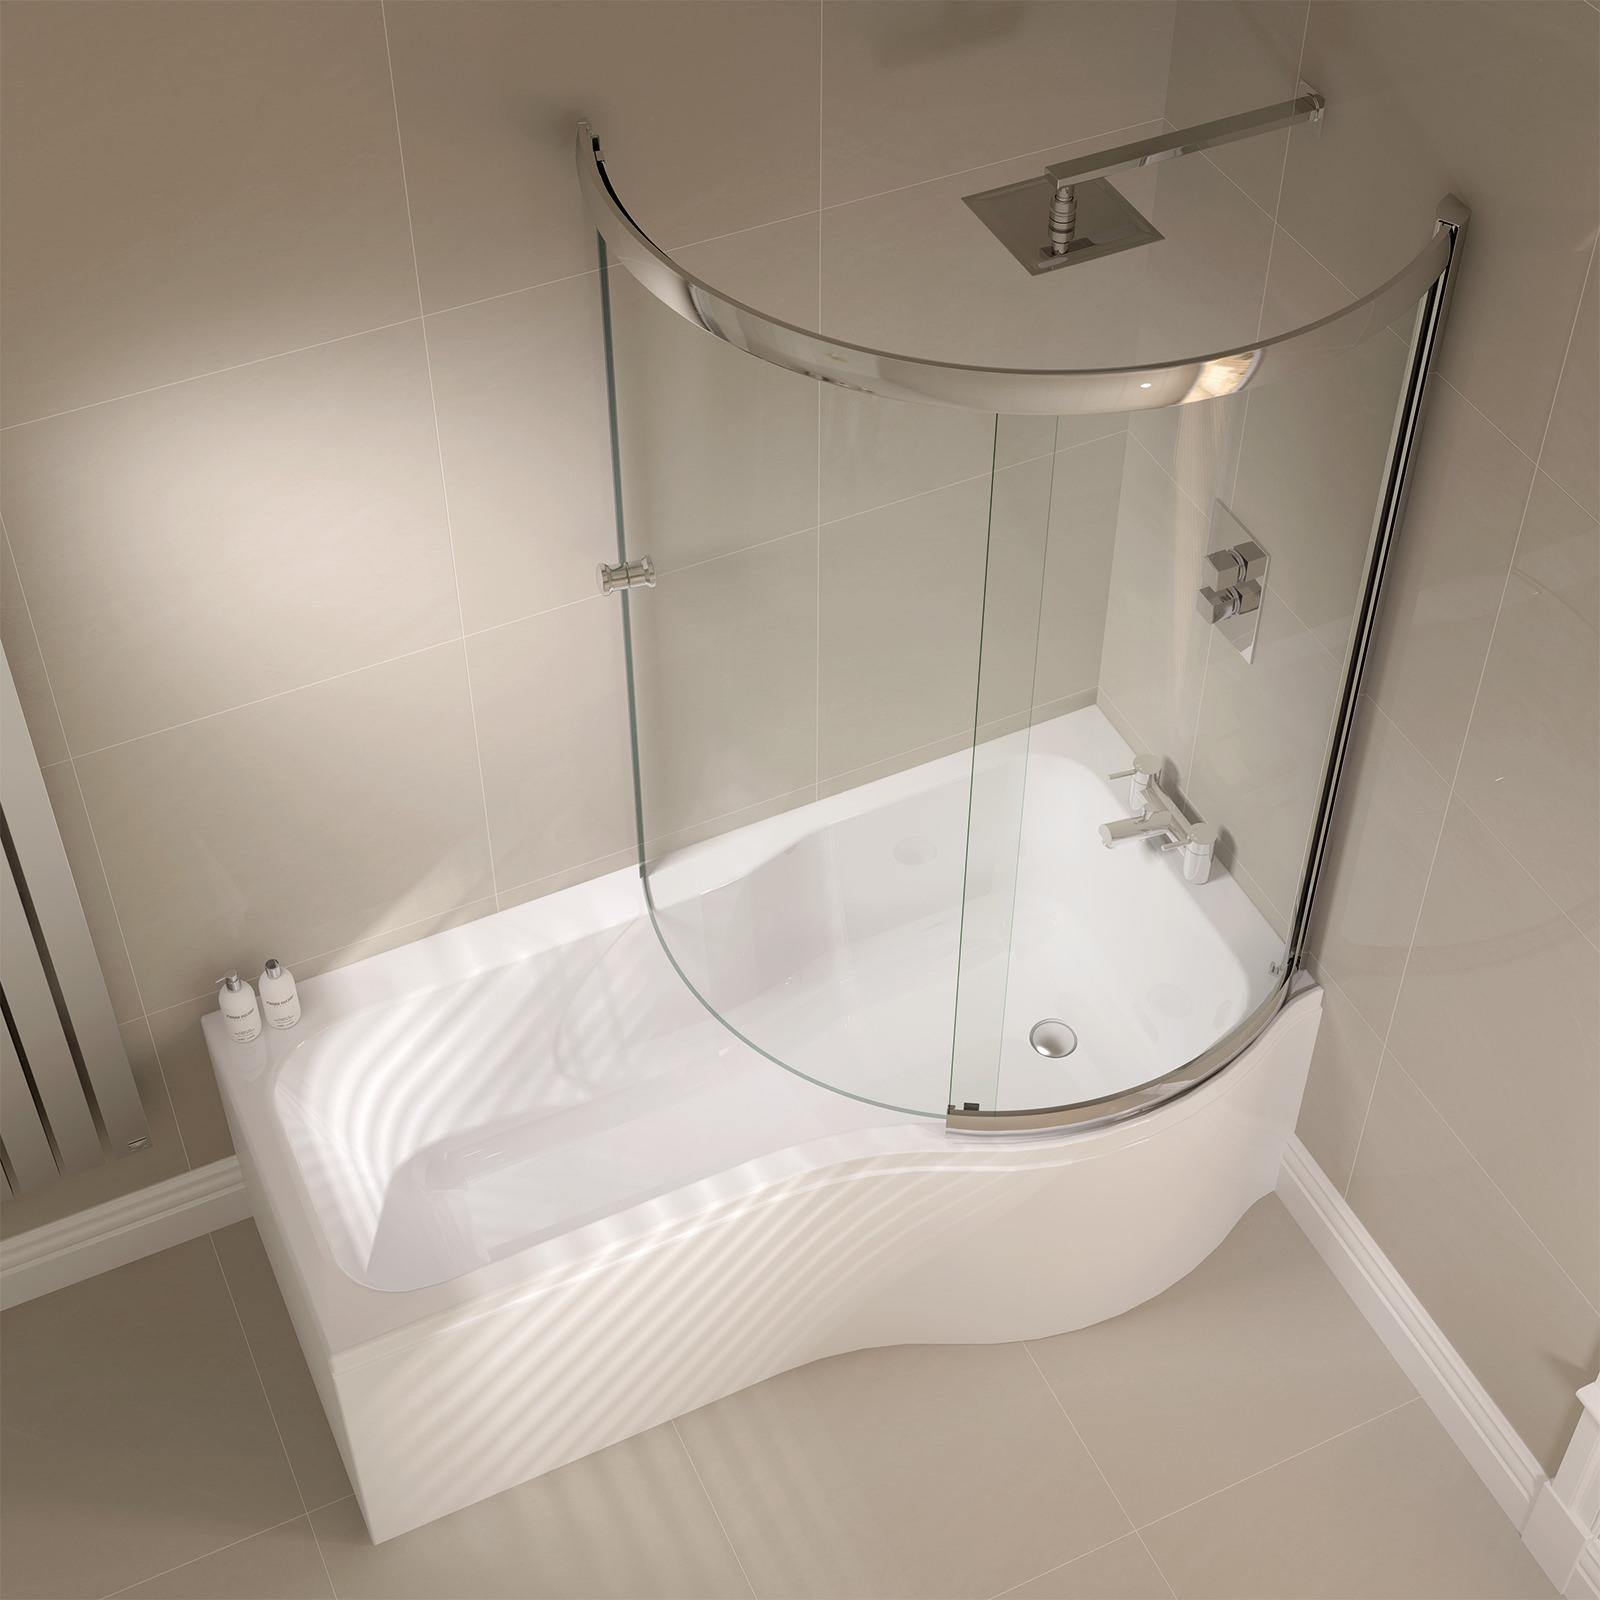 Additional Image Of April Prestige 984 X 1500mm P Shaped Sliding Bath Screen